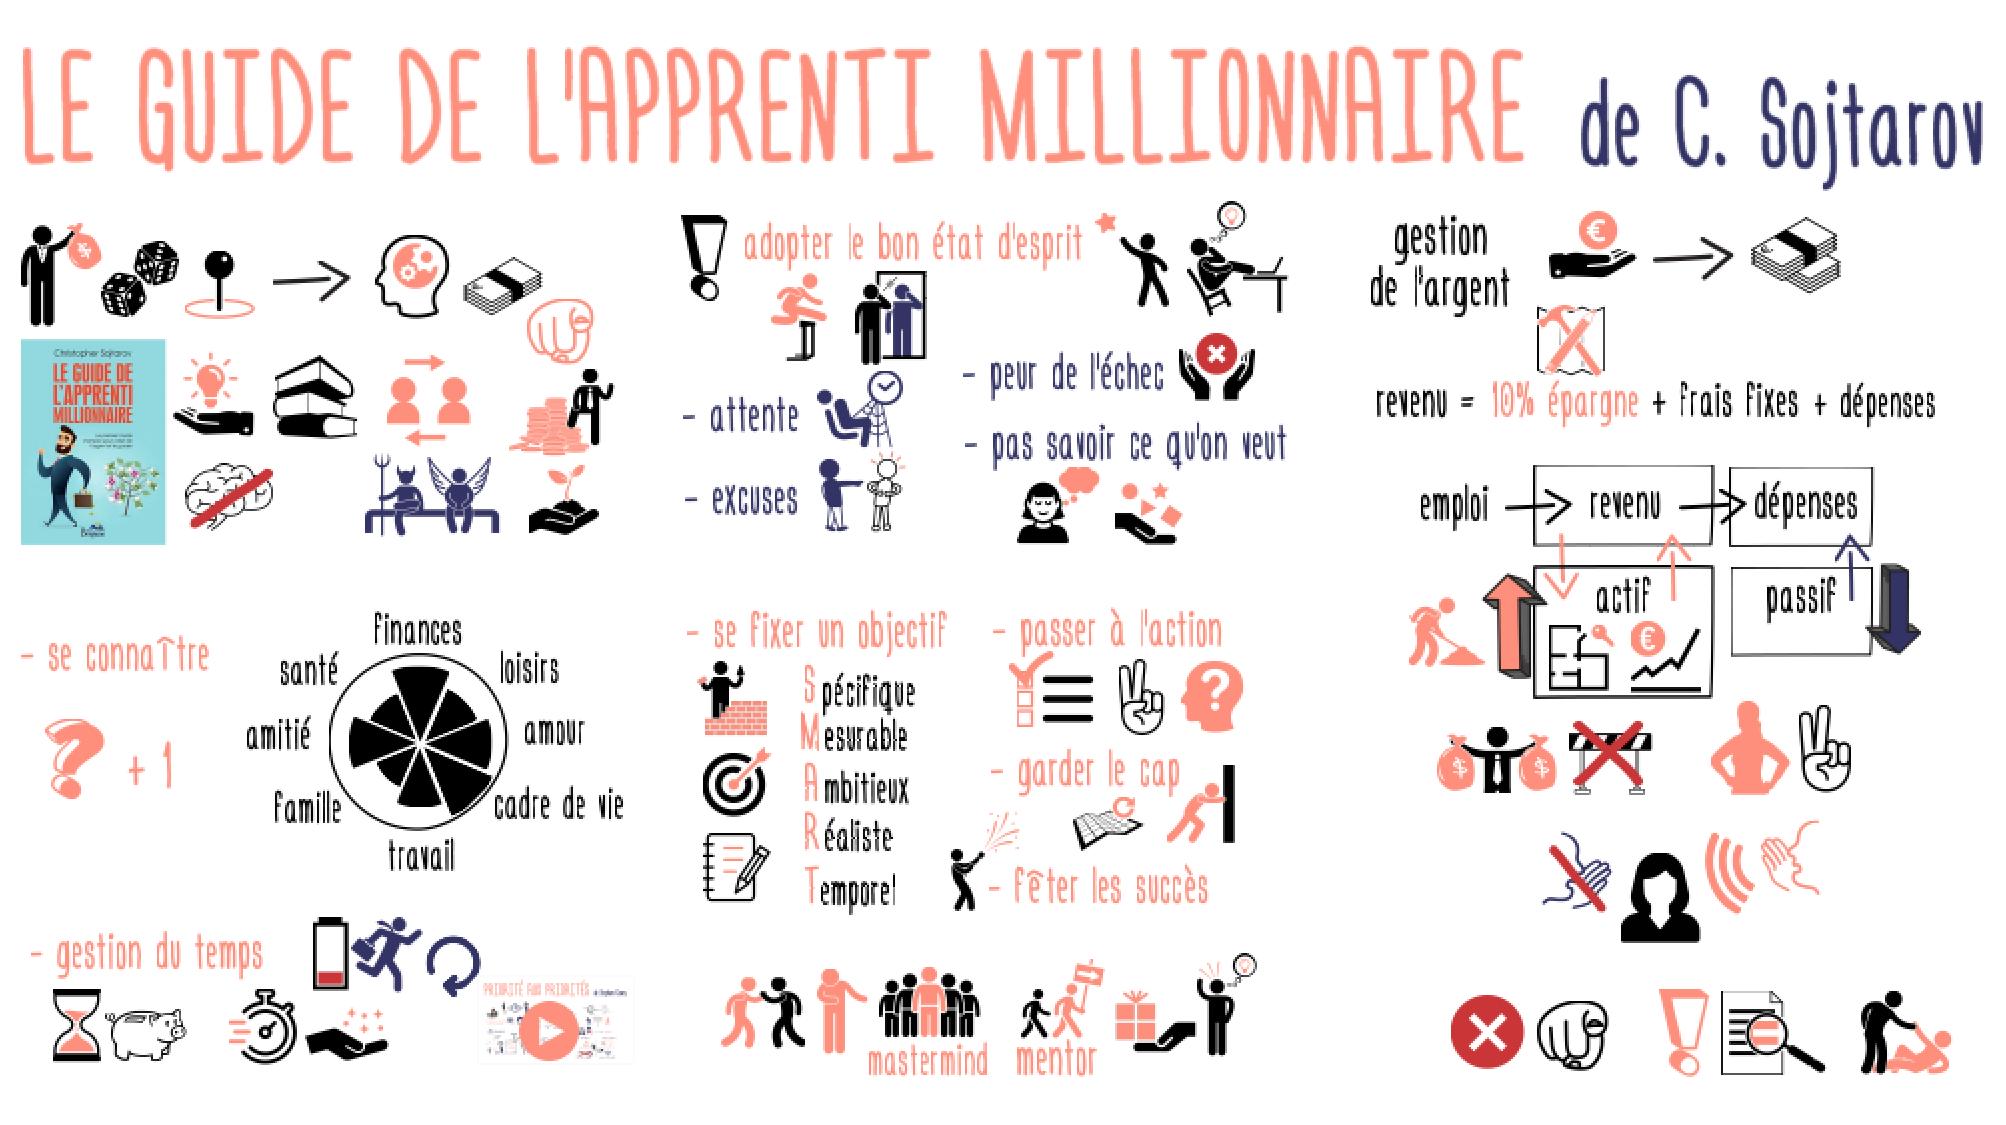 GuideApprentiMillionnaire